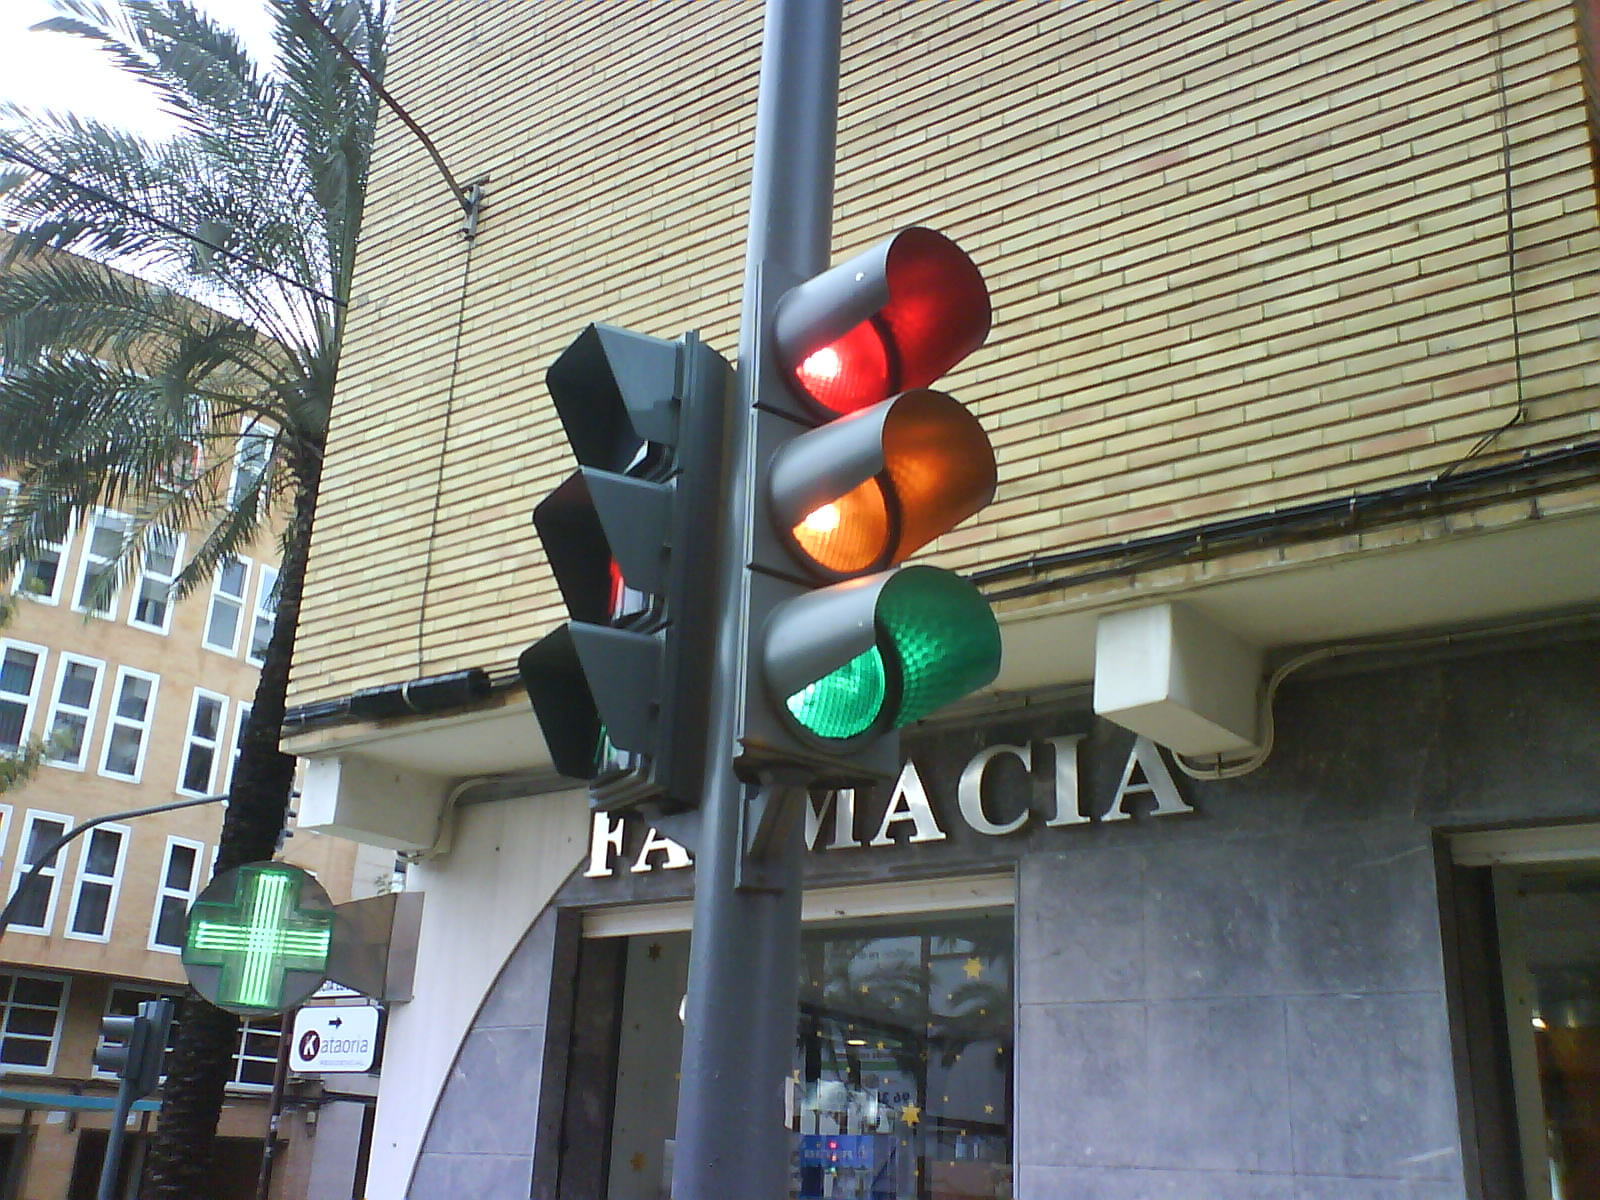 traffic light sequences